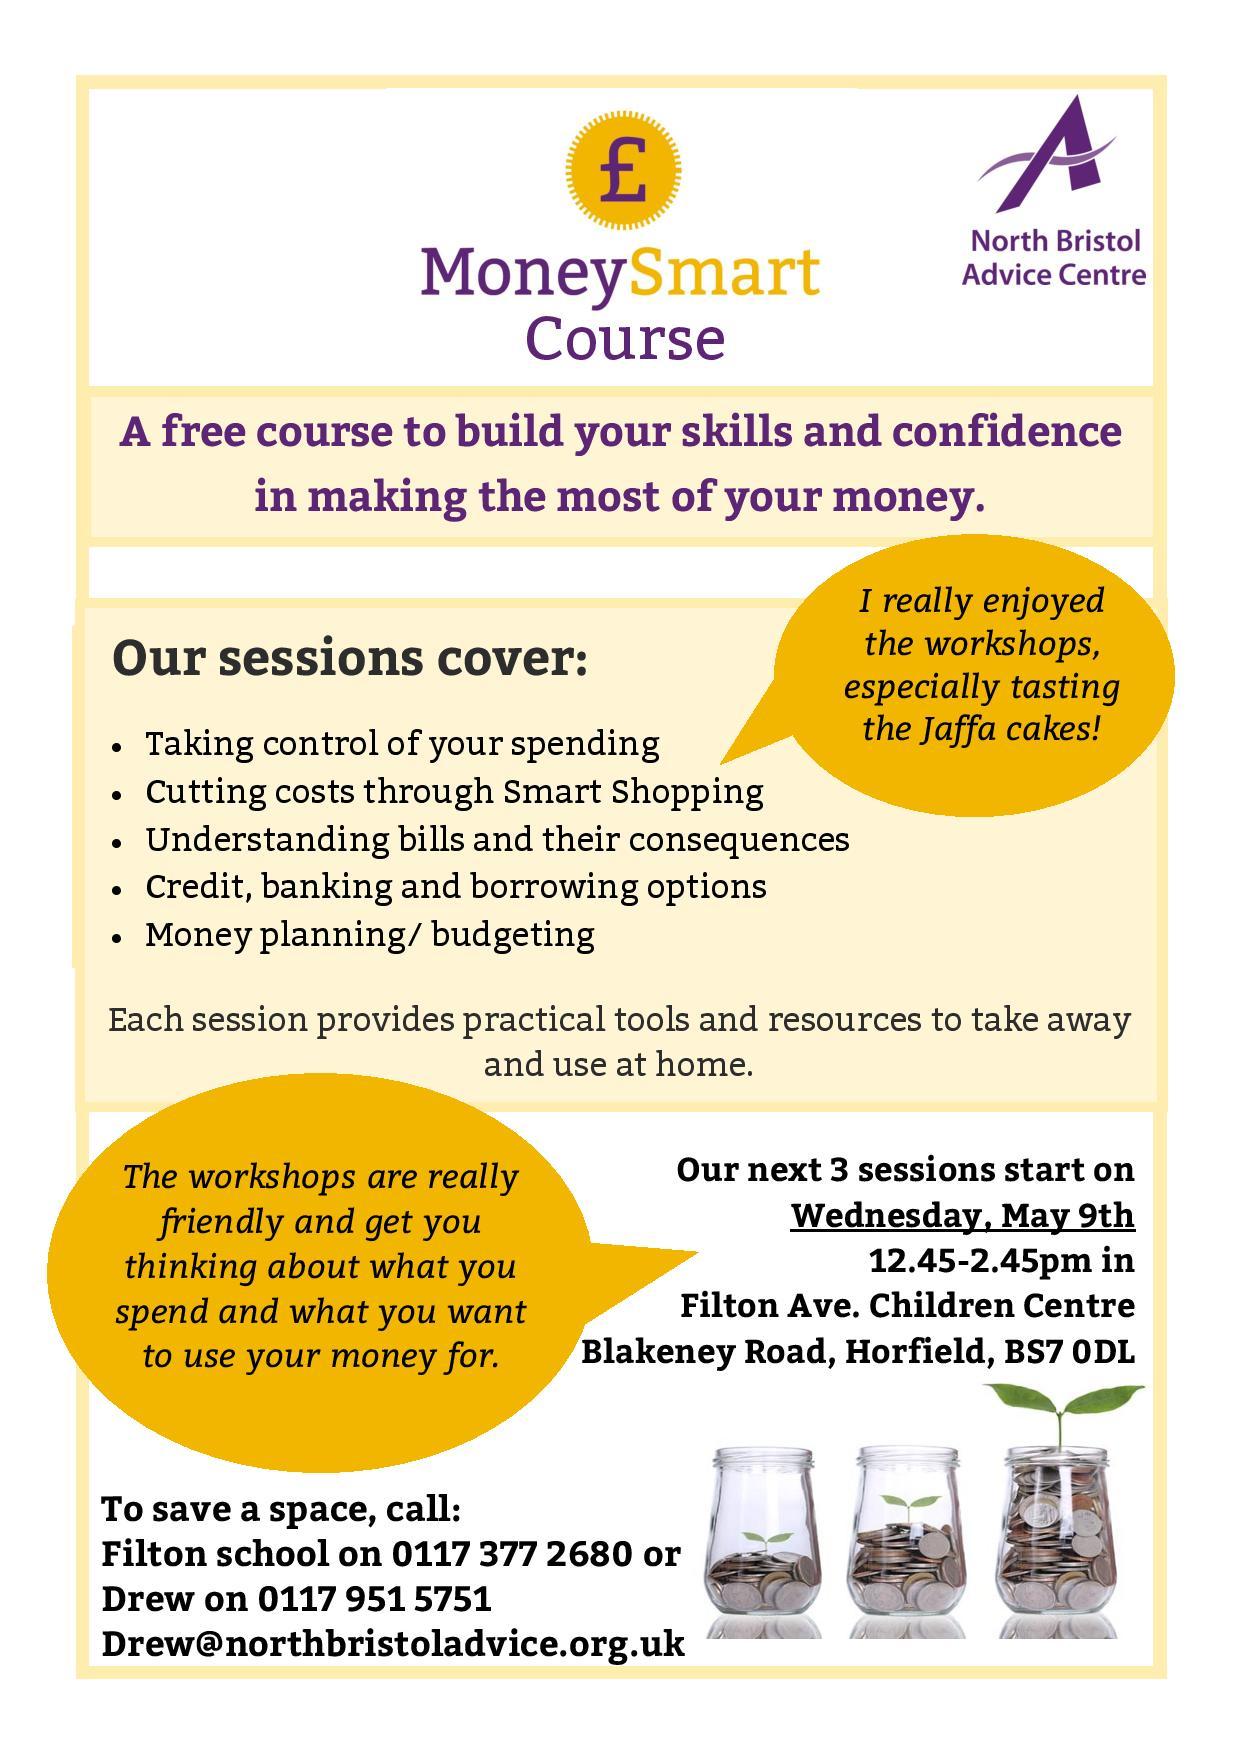 MoneySmart Filton 18 - poster (1)-page-001.jpg